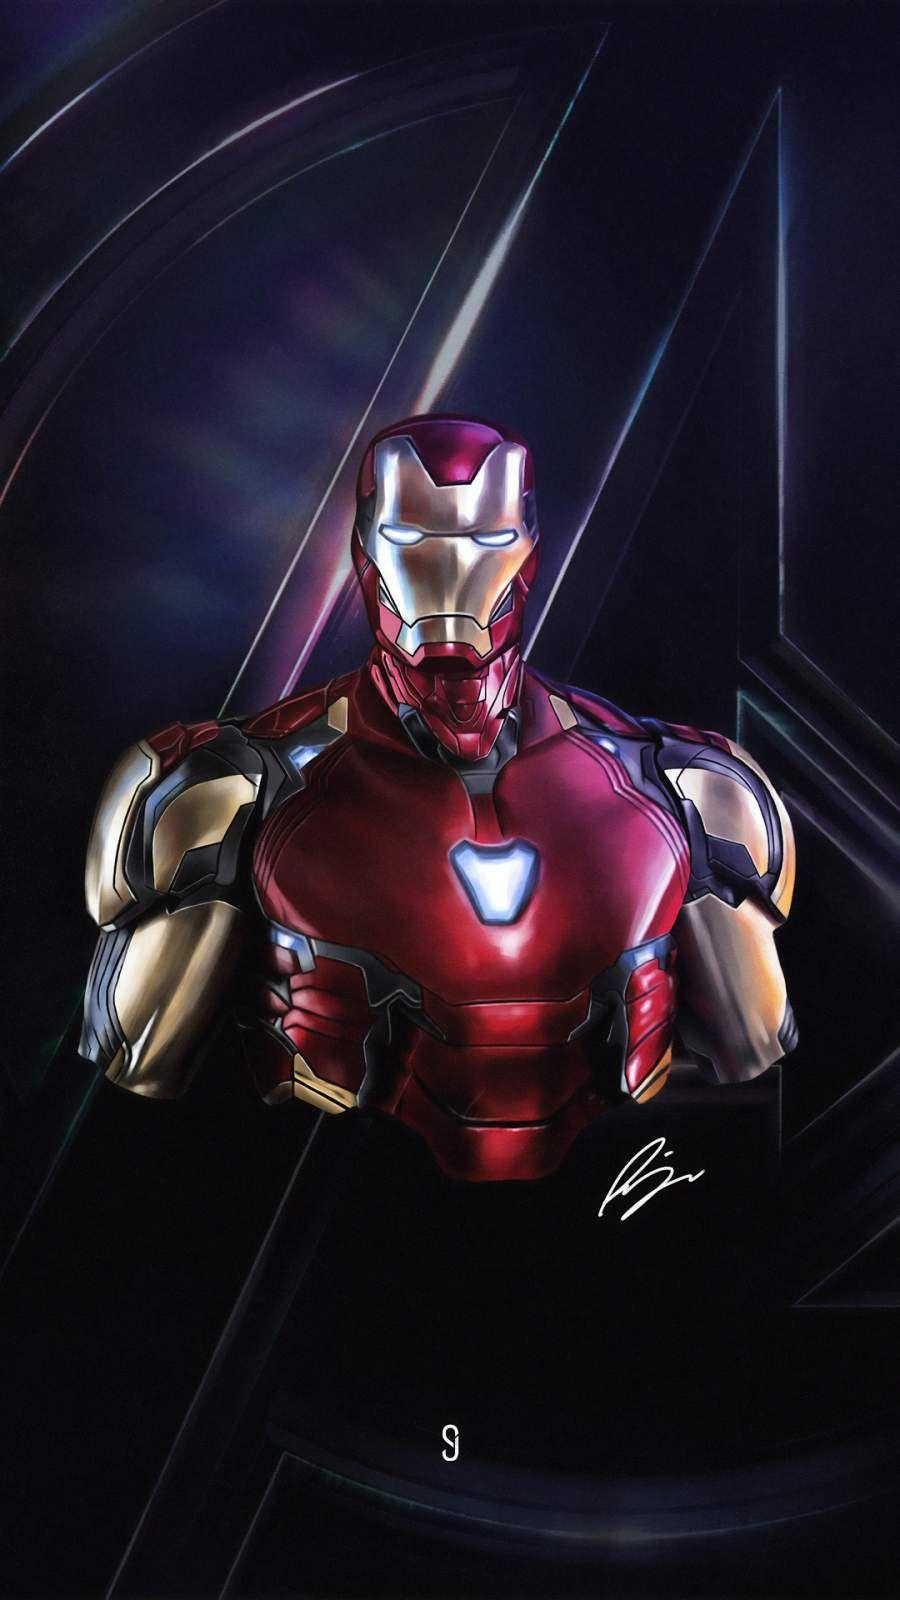 Iron man avengers 4k iphone wallpaper in 2020 iron man